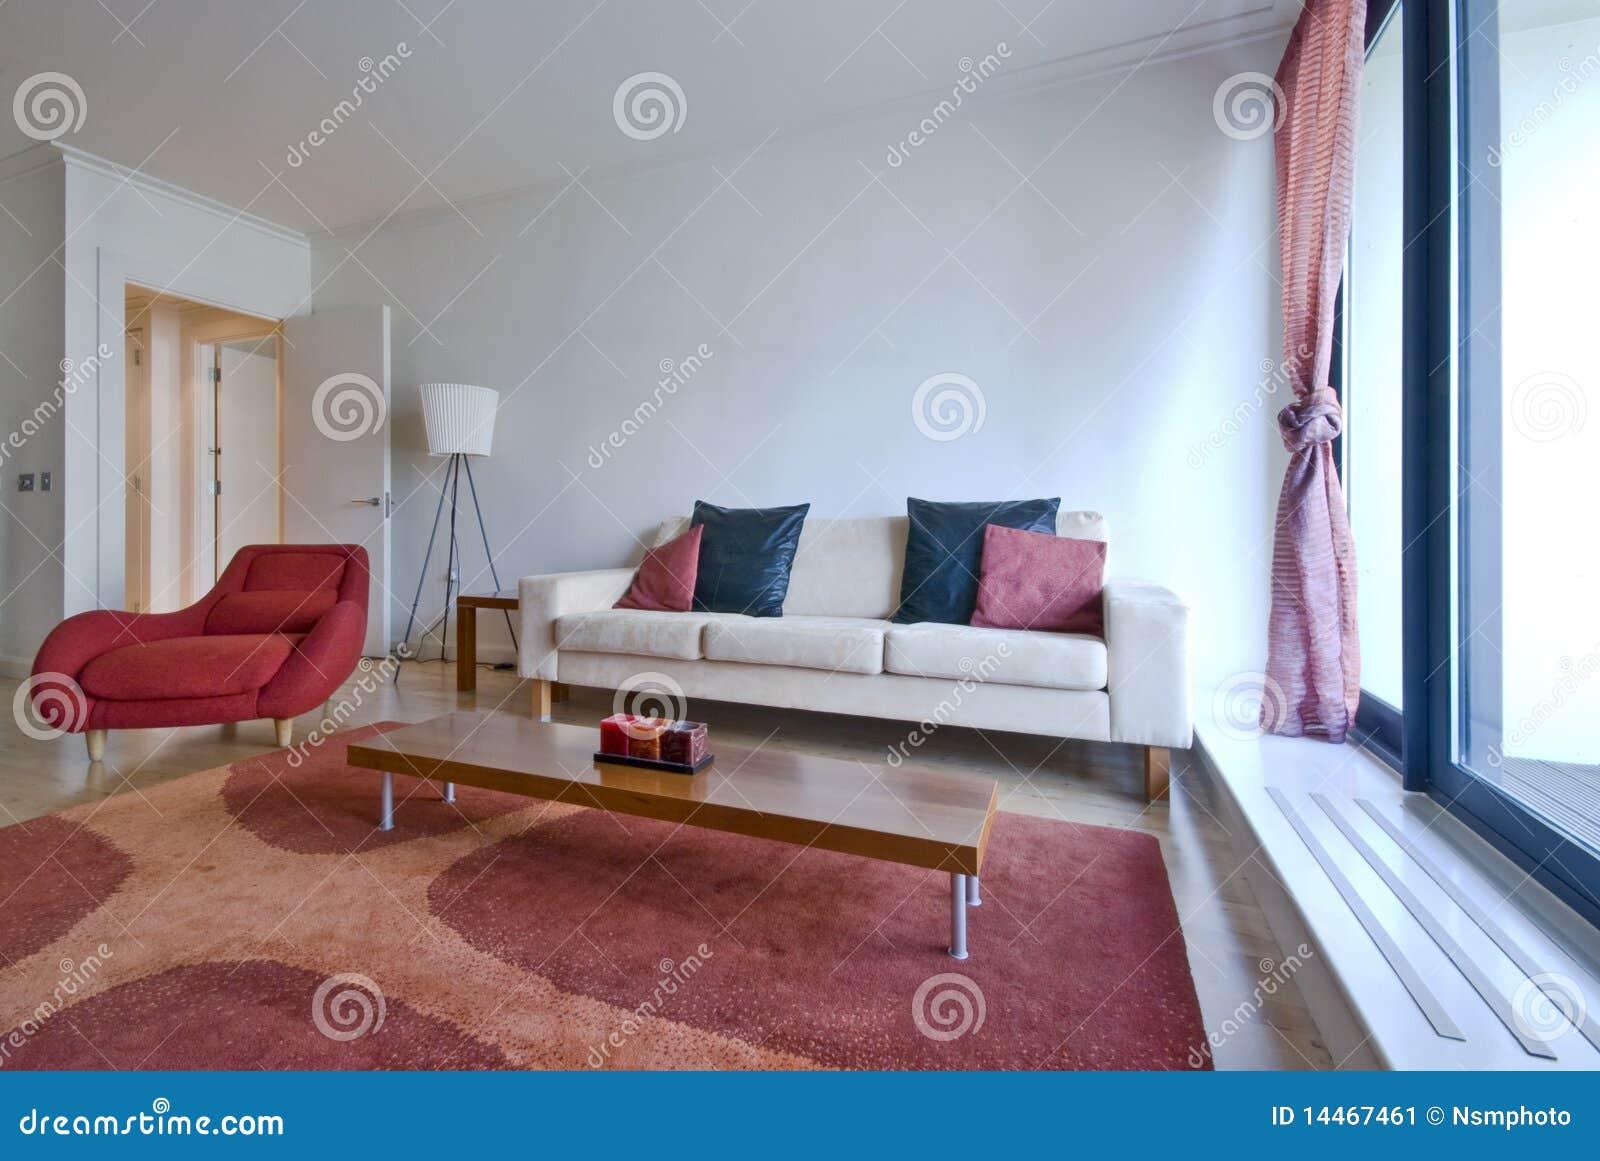 Modern living area with designer furniture